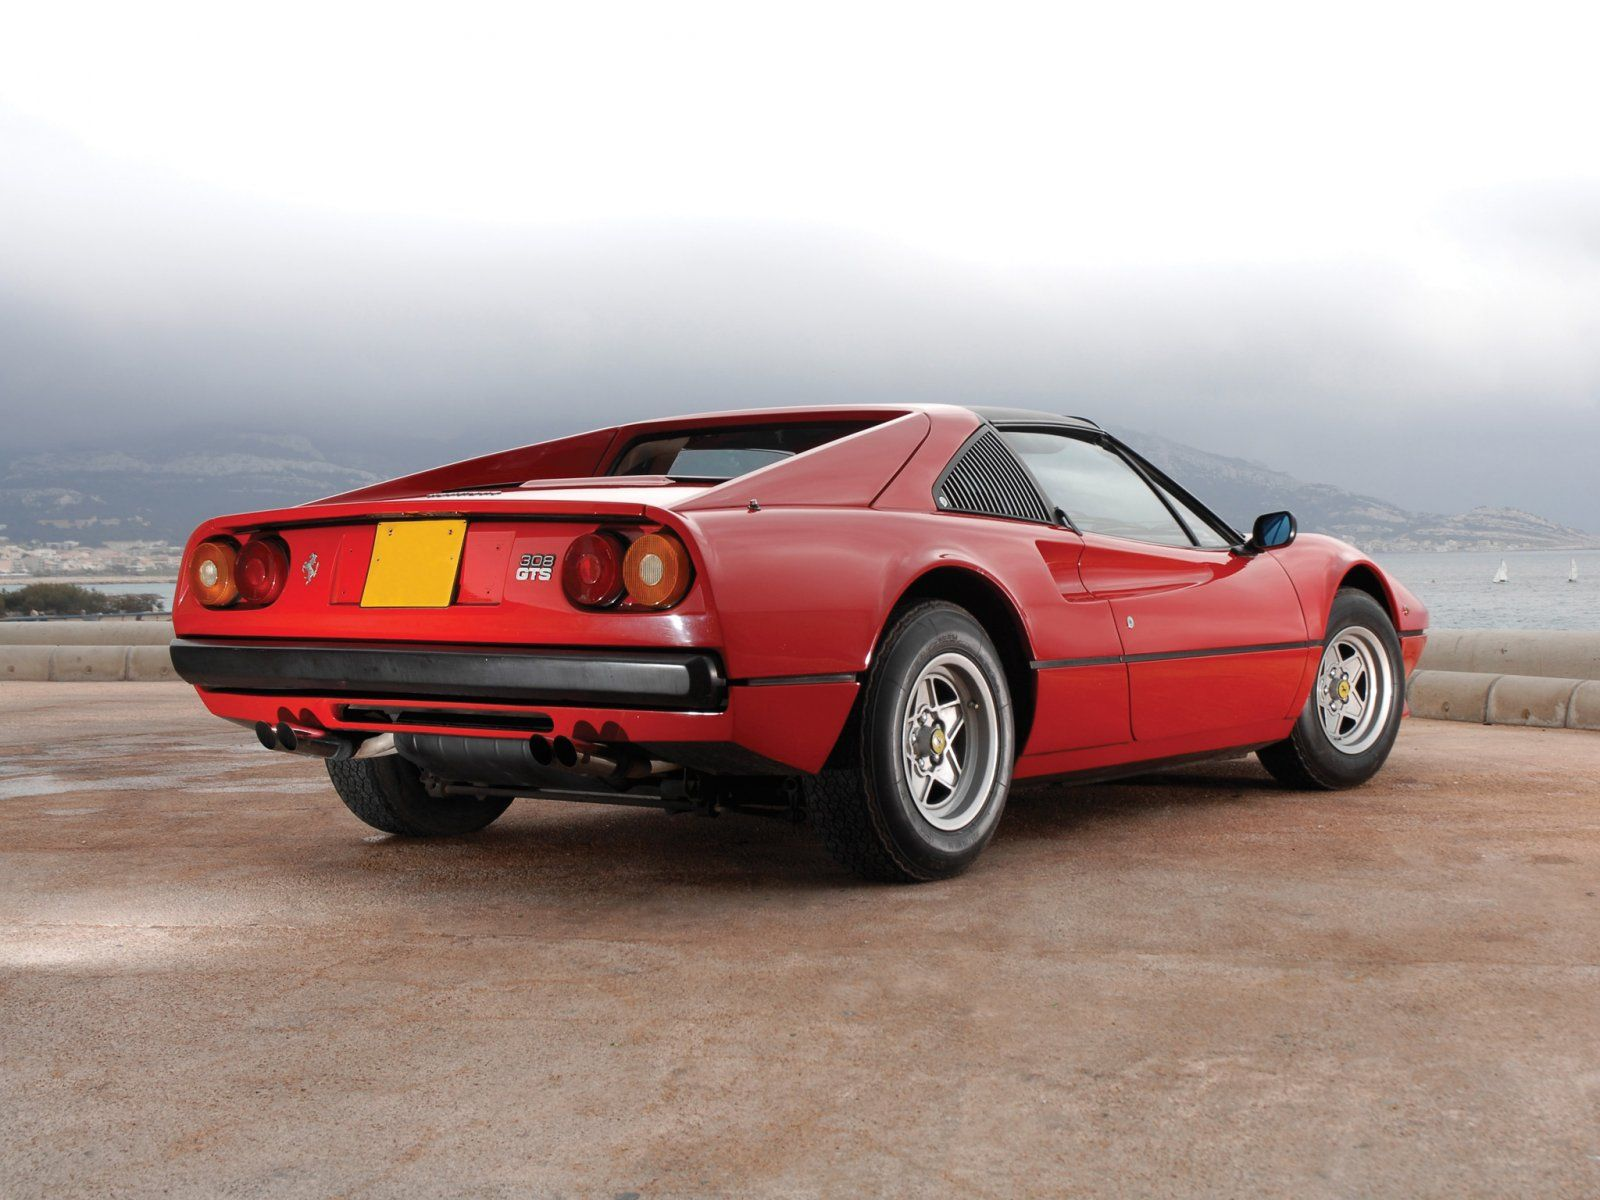 Ferrari 308 GTBGTS Ferrari, Vintage cars, Ferrari car